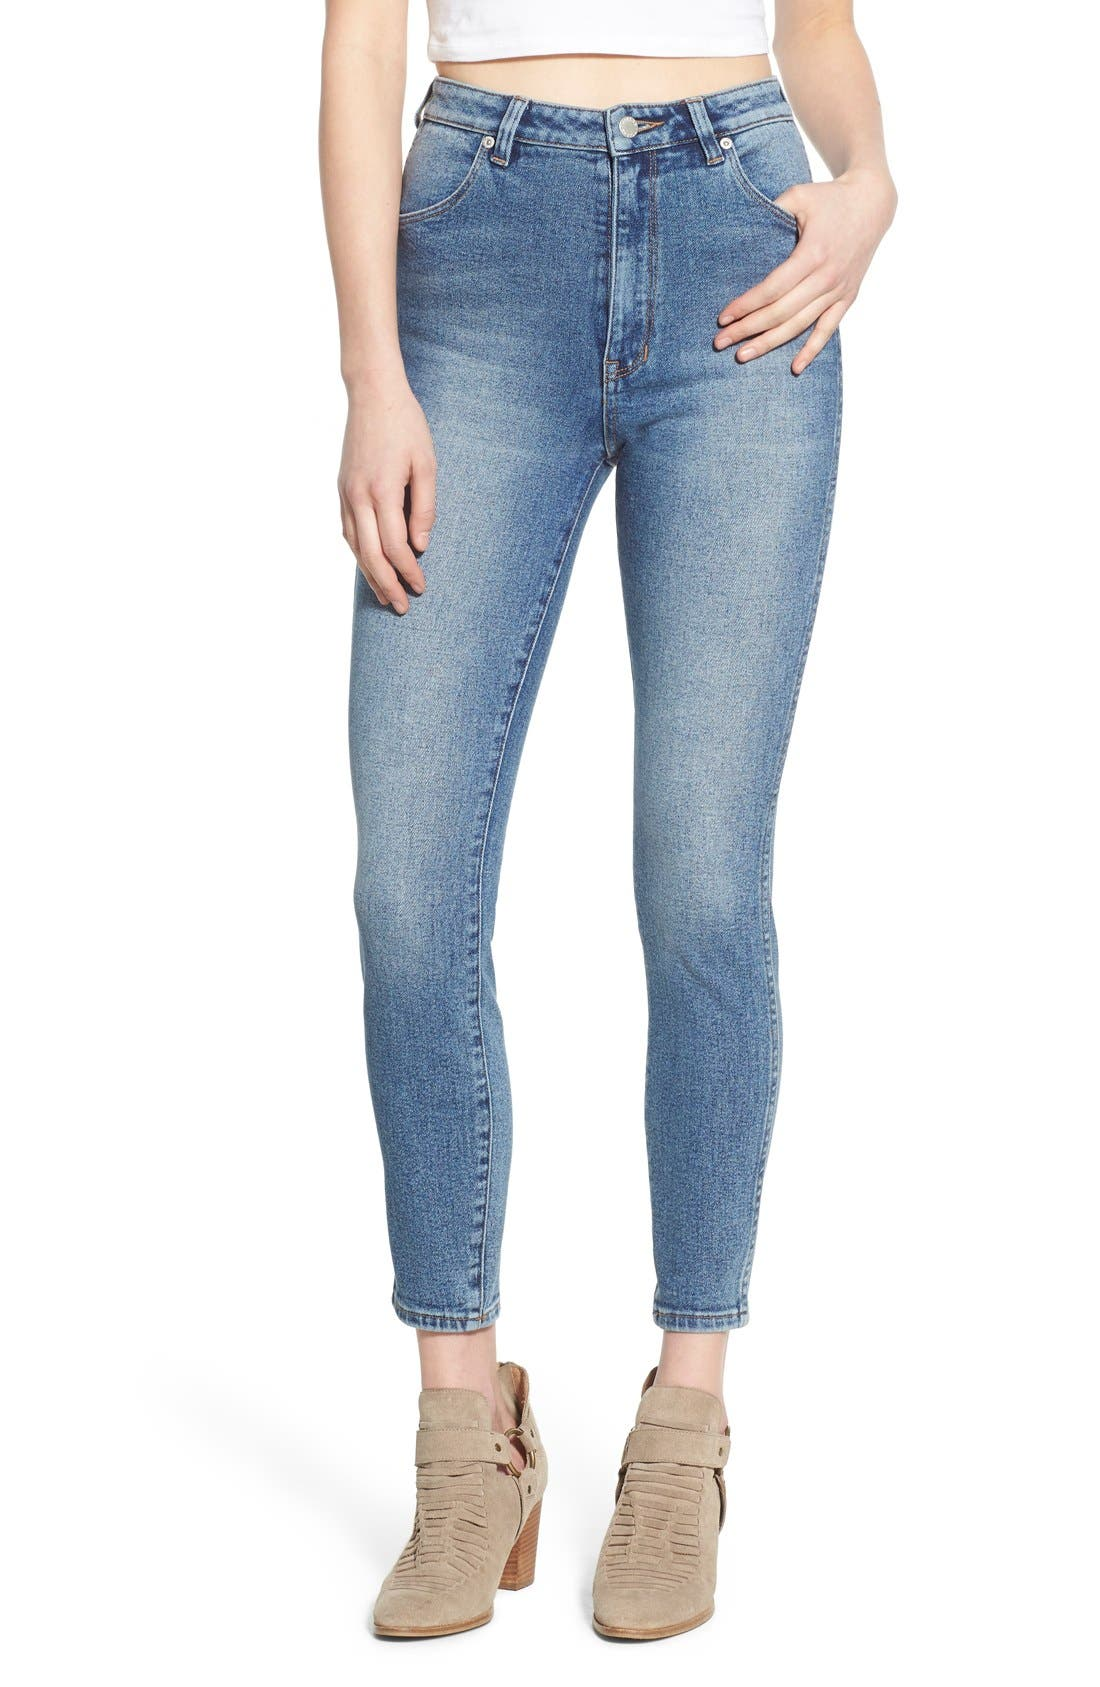 Main Image - Rolla's 'East Coast' High Rise Ankle Skinny Jeans (Folk Blue)